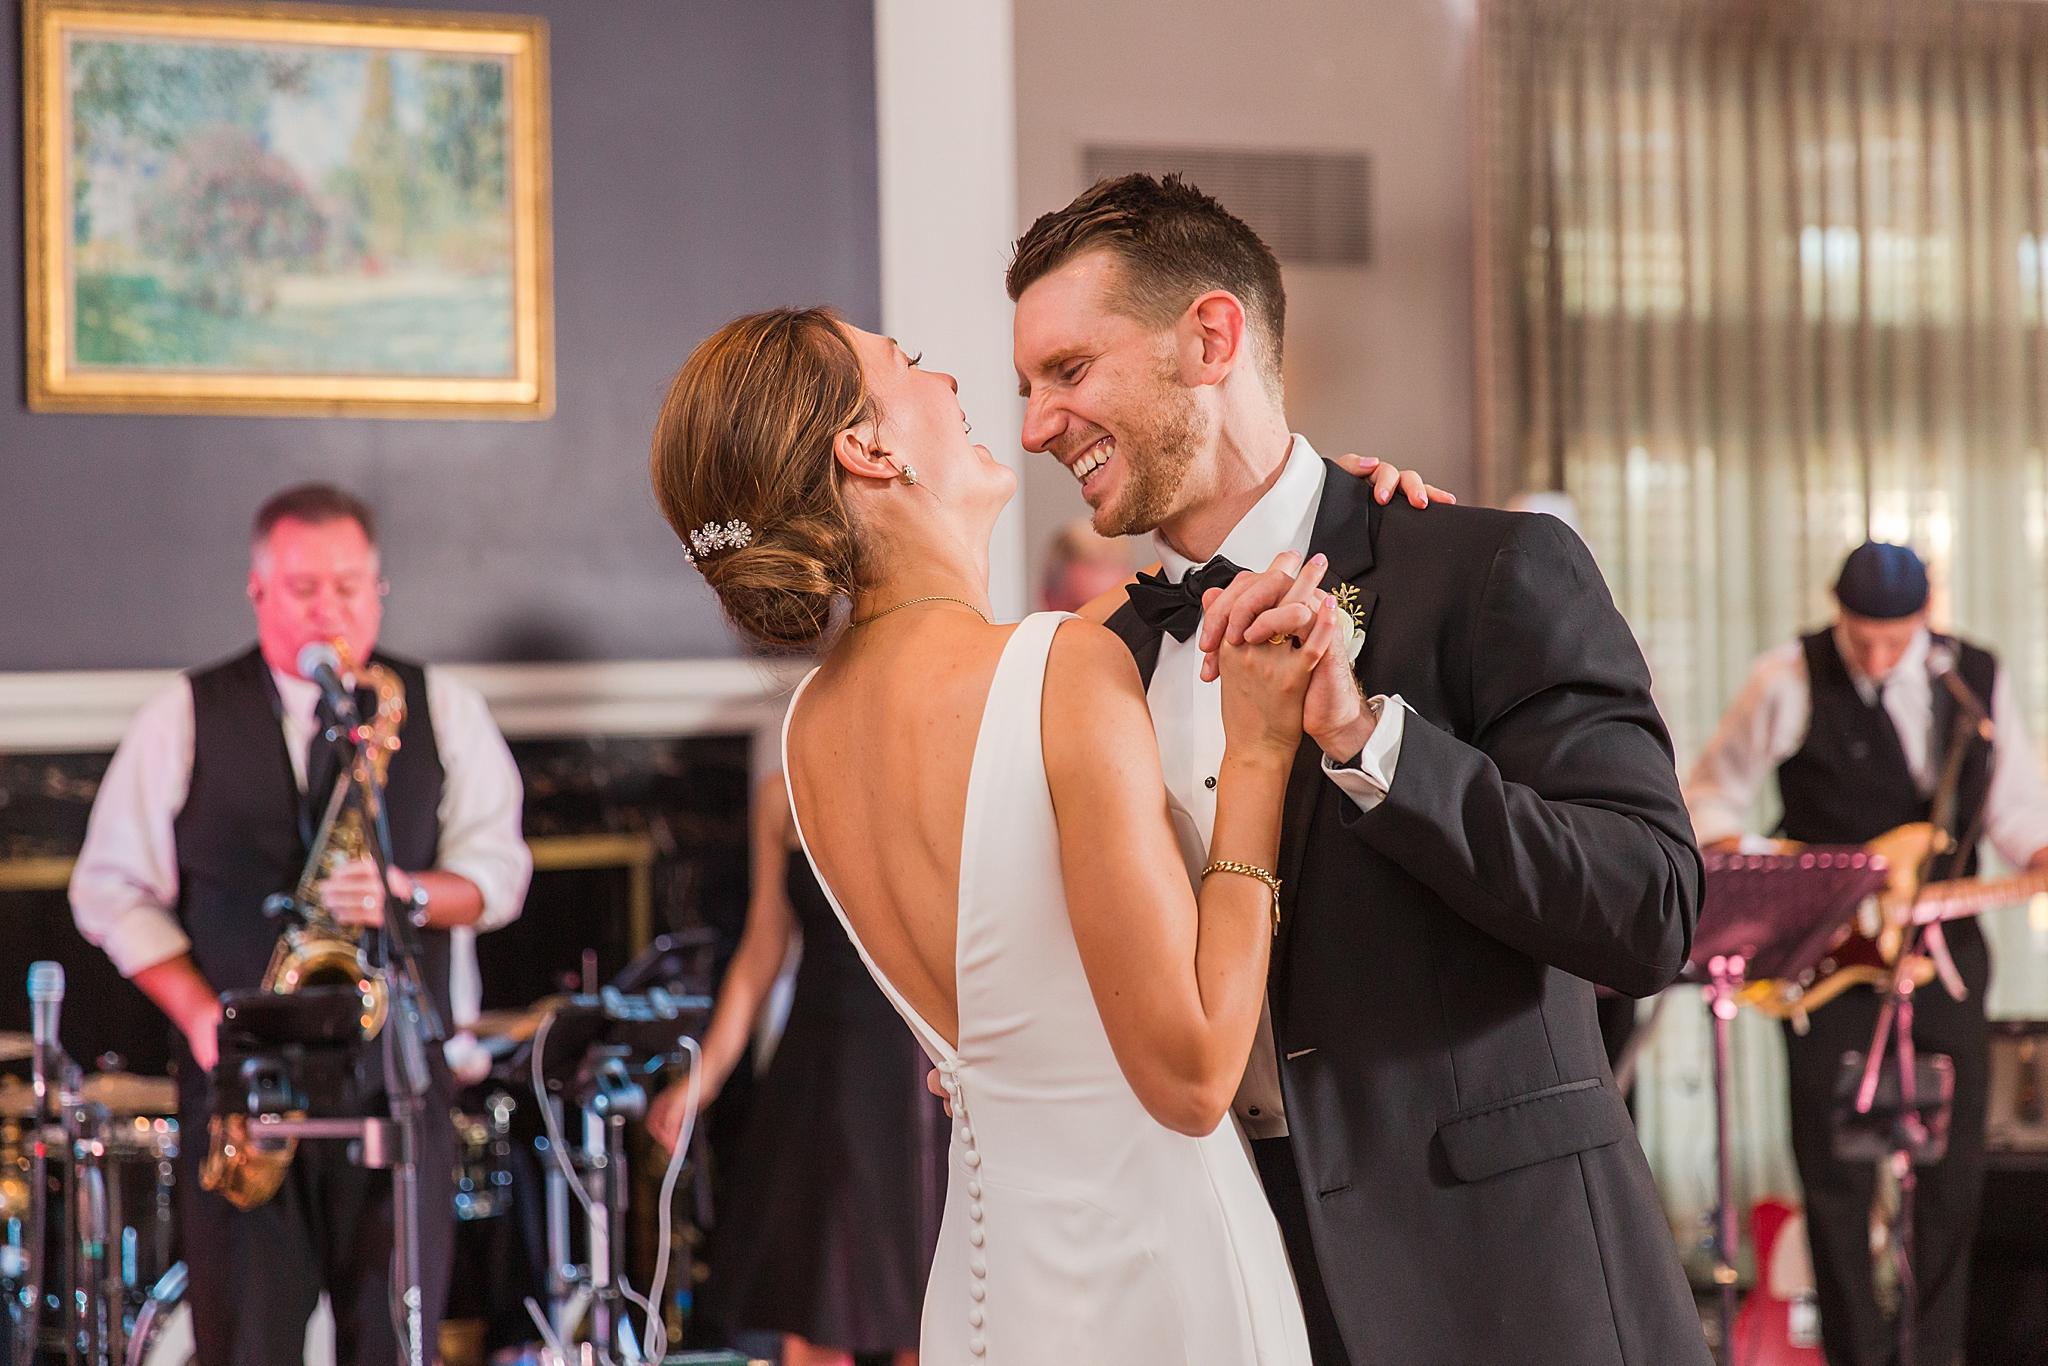 detroit-wedding-photographer-grosse-pointe-academy-chapel-detroit-golf-club-wedding-carly-matt-by-courtney-carolyn-photography_0089.jpg